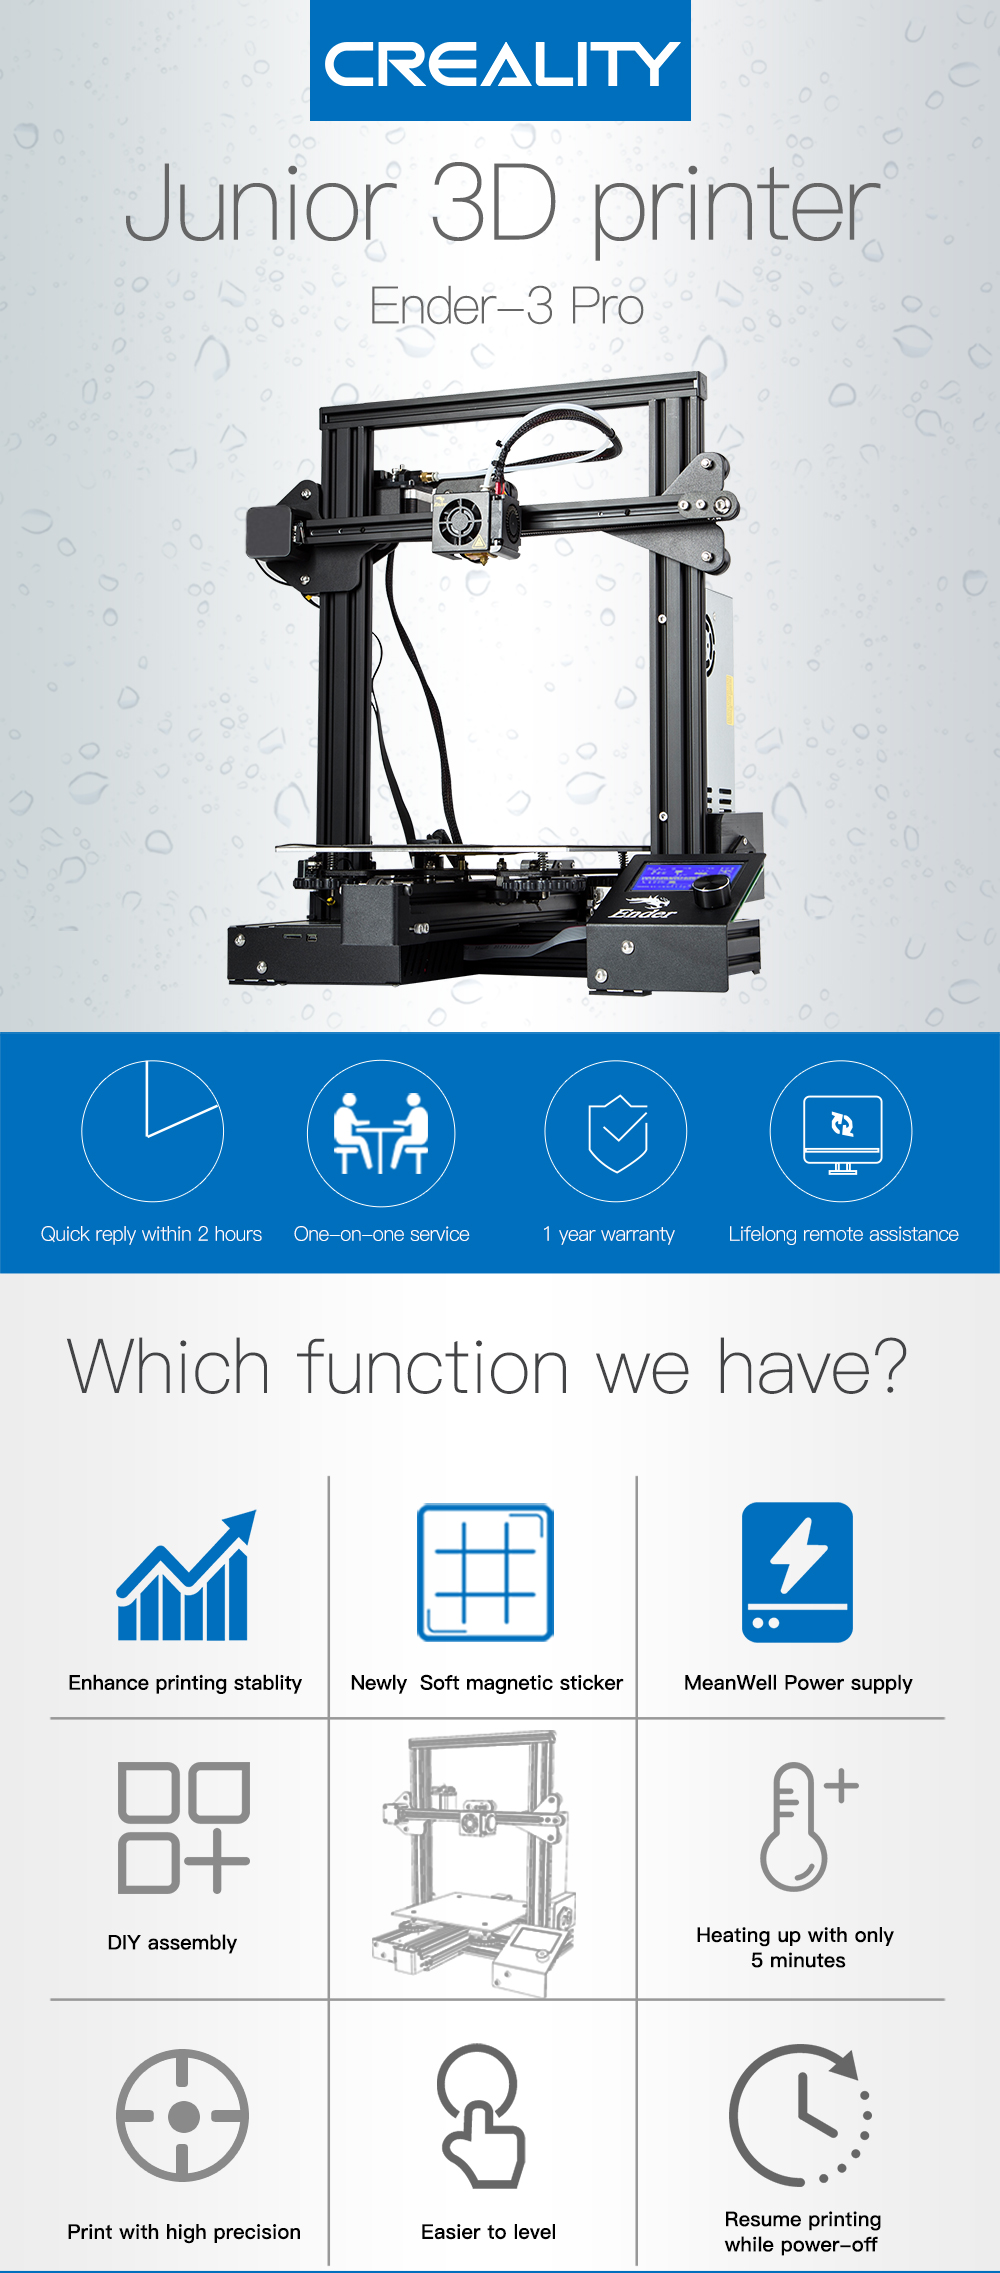 Creality 3D New Ender 3 / Ender-3 PRO DIY 3D Printer drucker impresora 3D  Self-assemble 220 * 220 * 250mm with Resume Printing